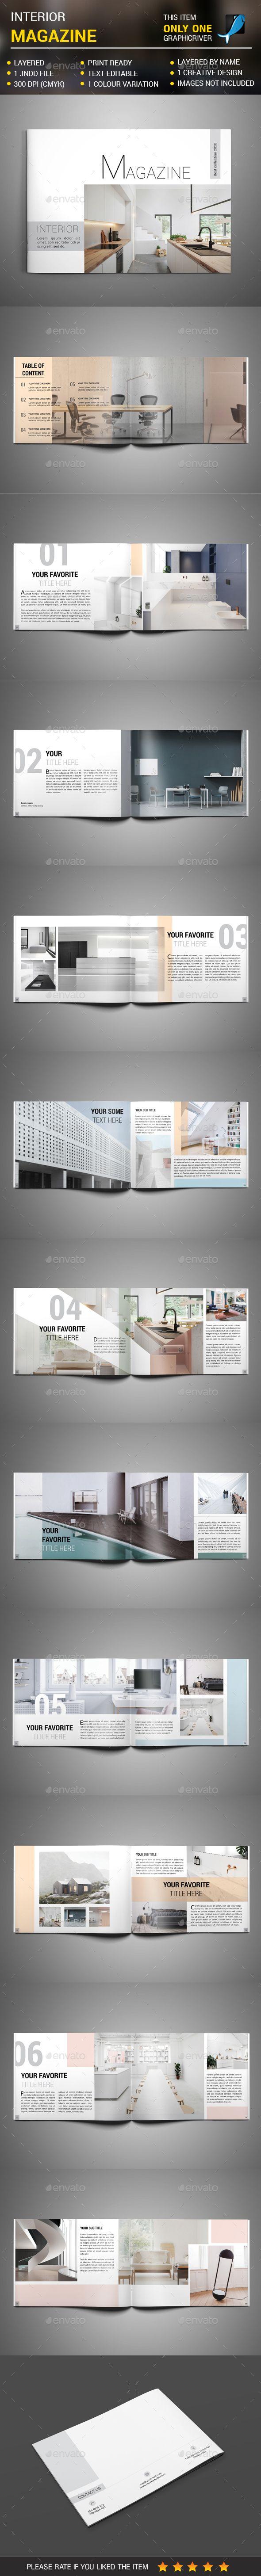 Landscape Interior Magazine - #Magazines Print Templates